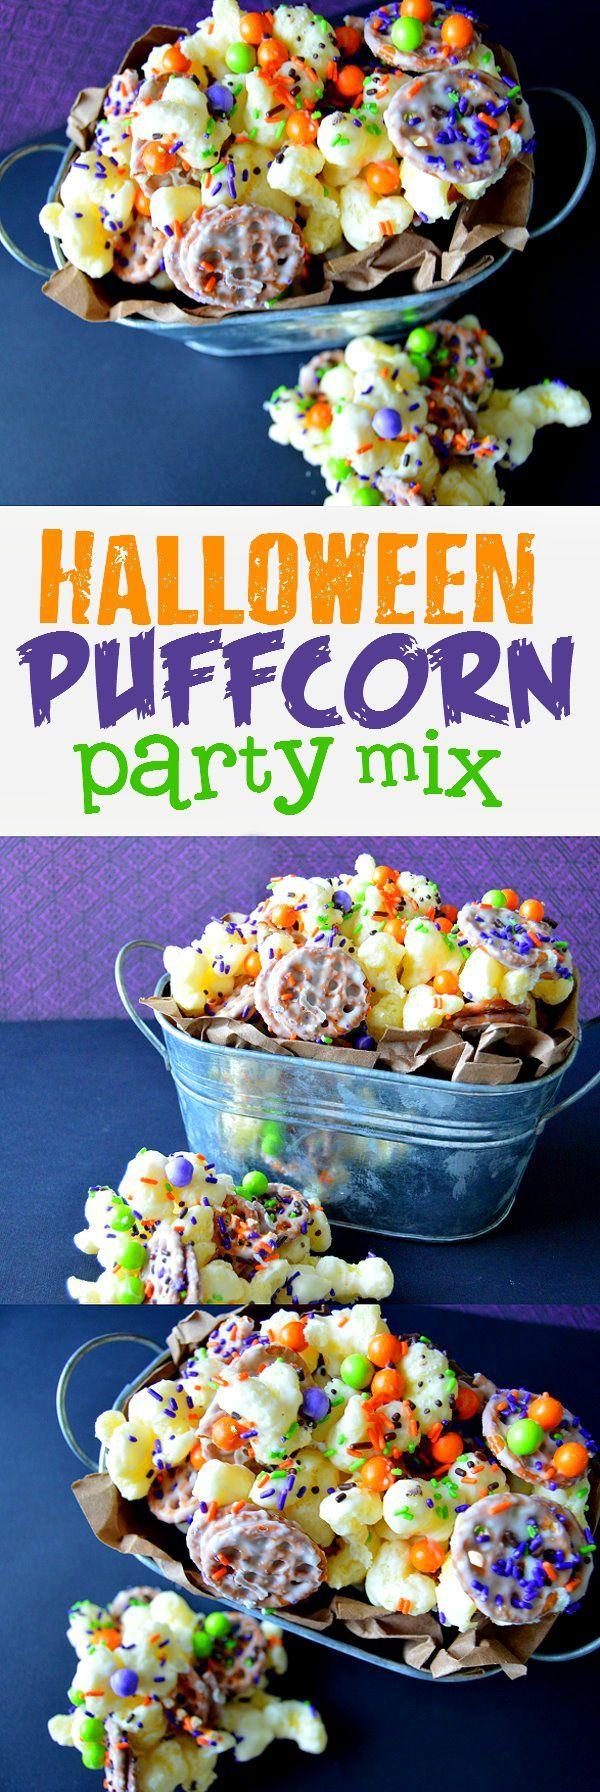 halloween puffcorn party mix | time kids, autumn fall and pretzels